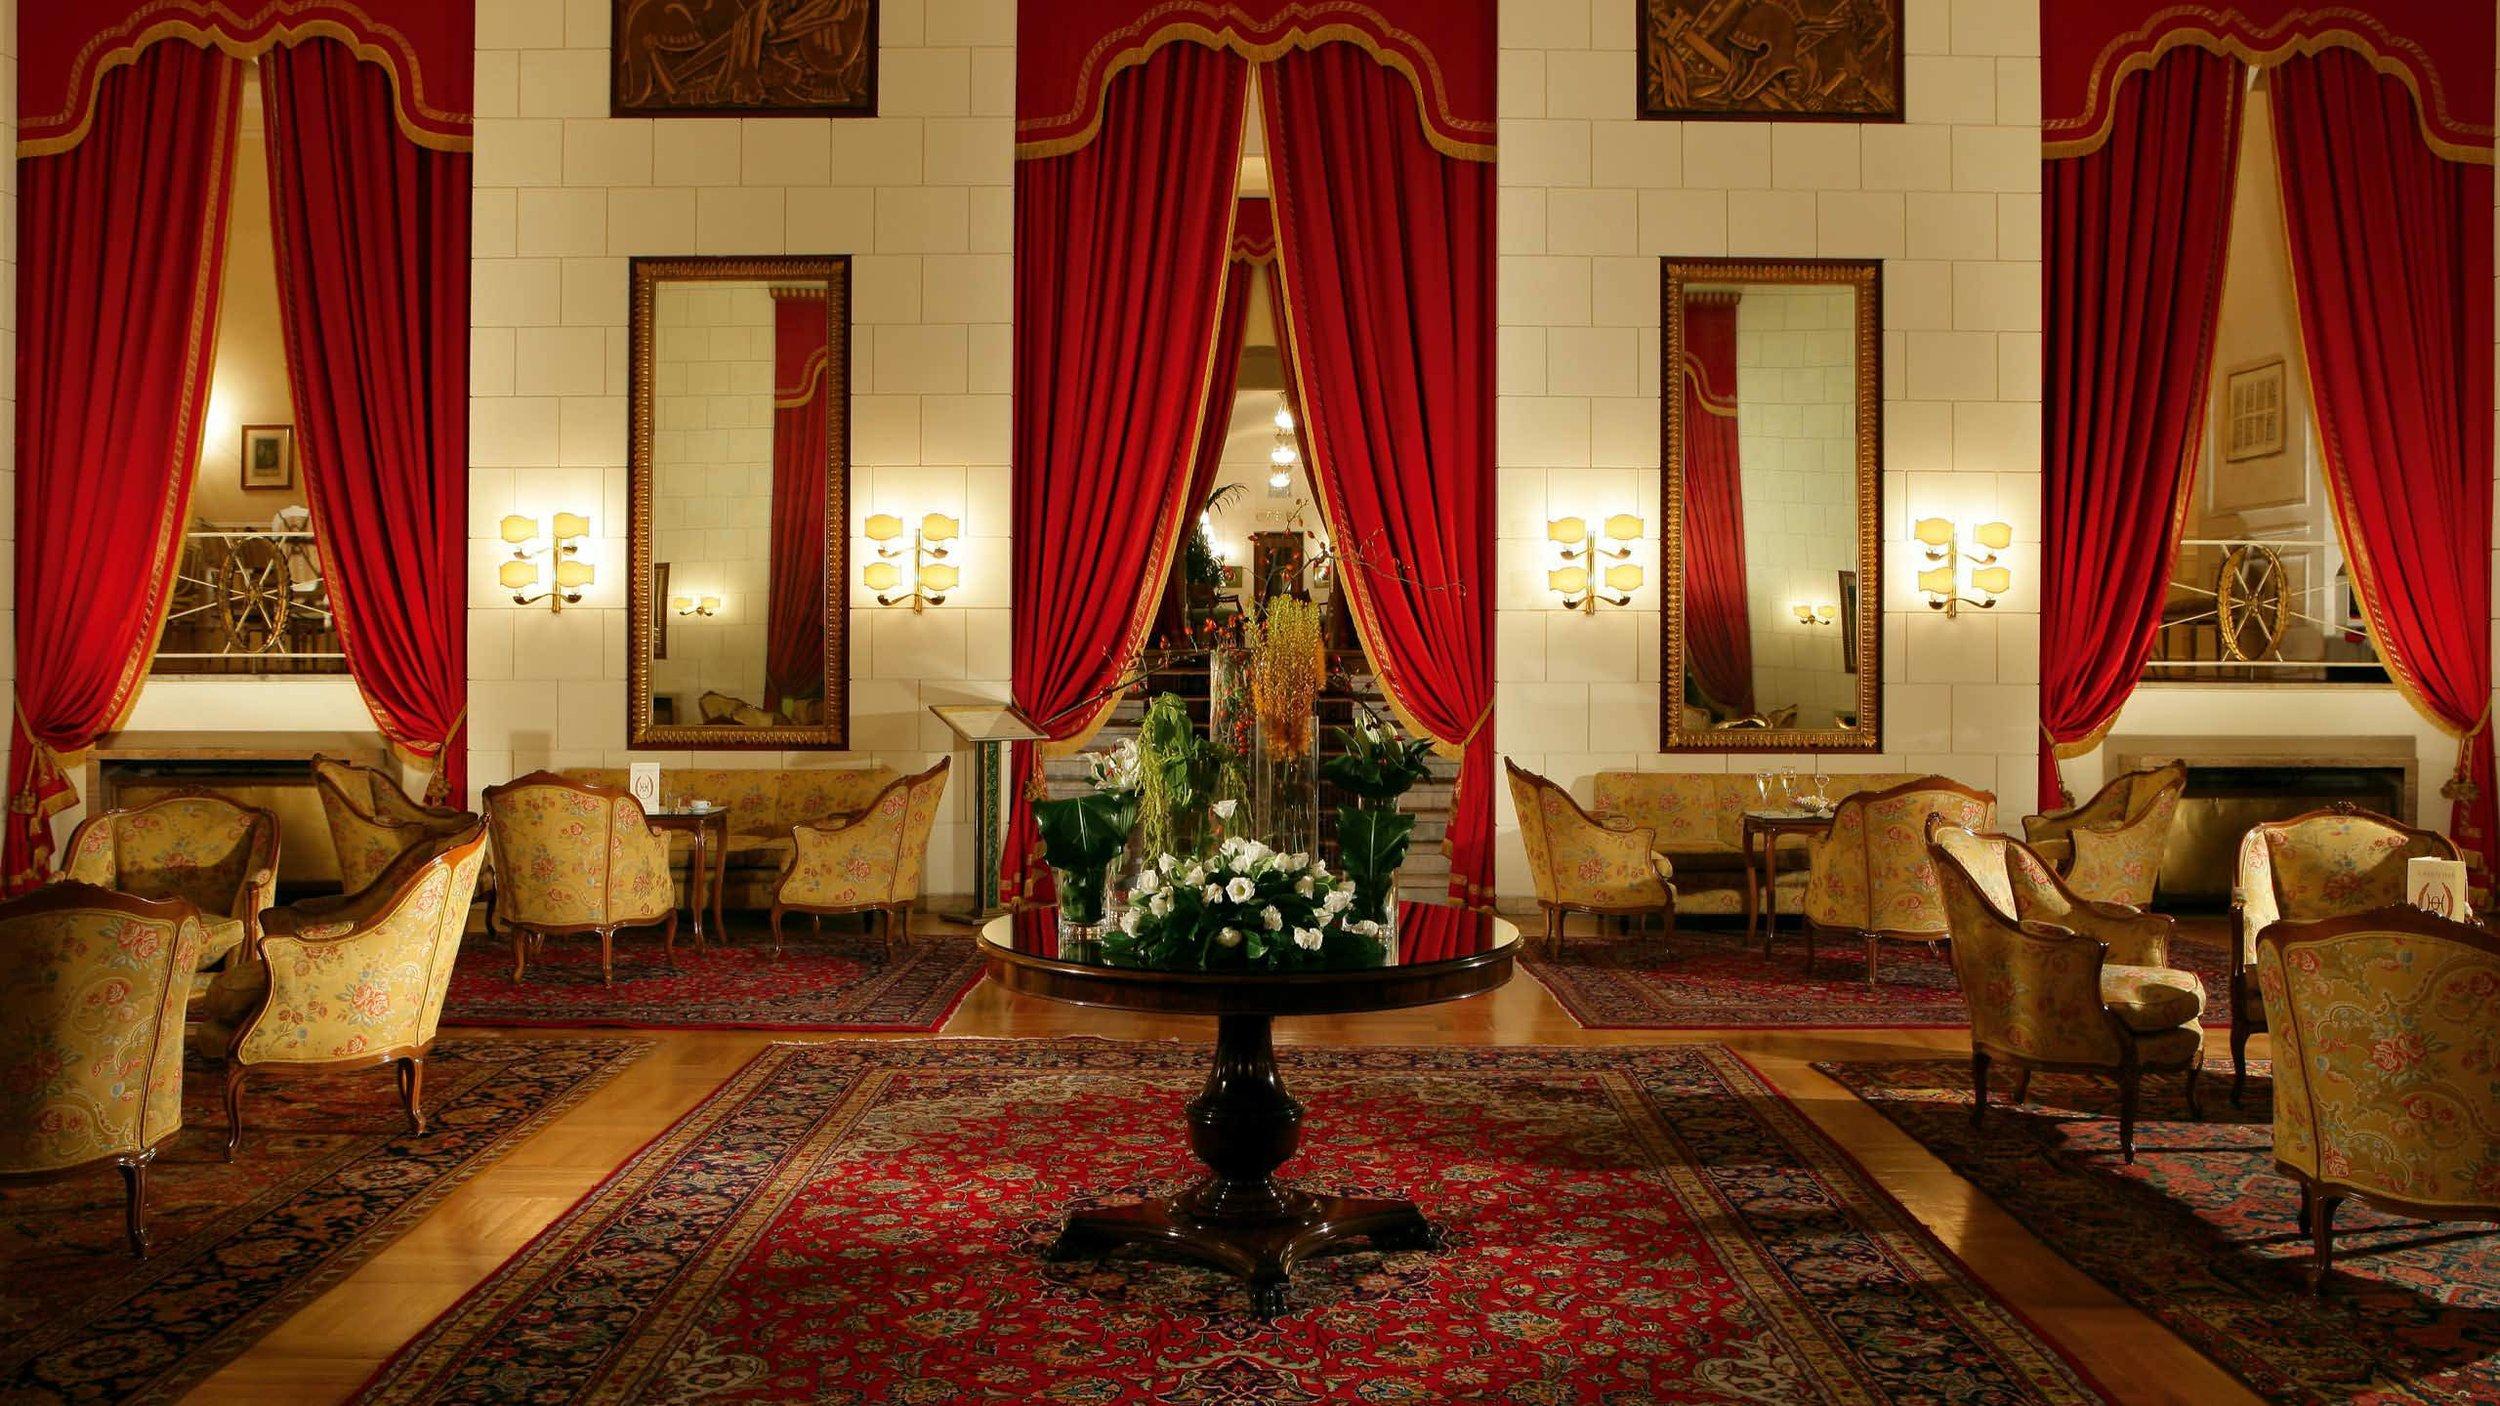 Hotel-Quirinale-Roma-hall.jpg